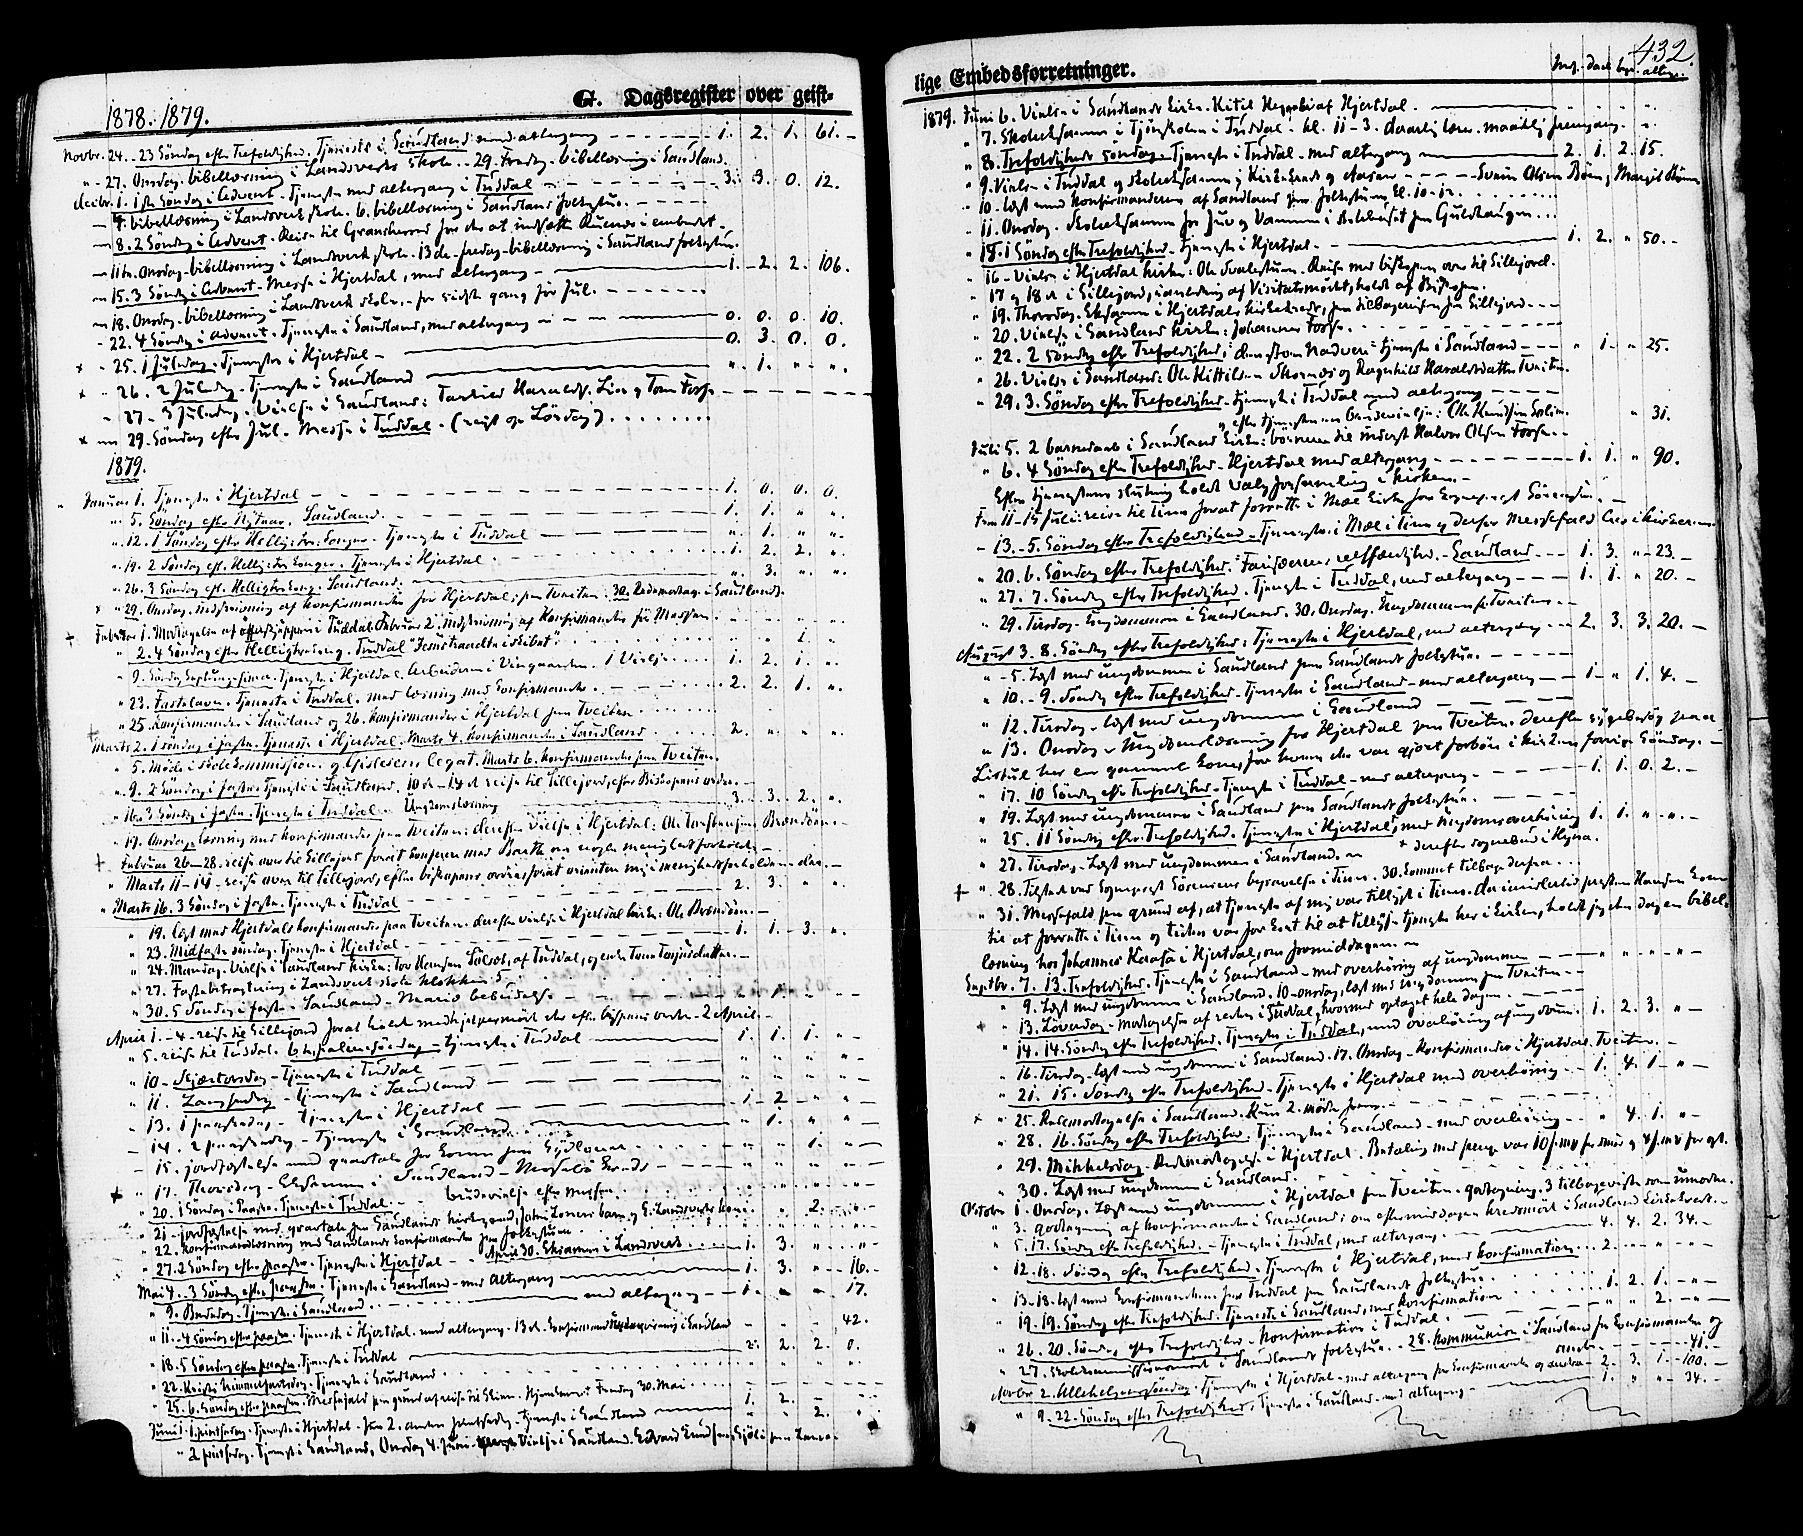 SAKO, Hjartdal kirkebøker, F/Fa/L0009: Ministerialbok nr. I 9, 1860-1879, s. 432